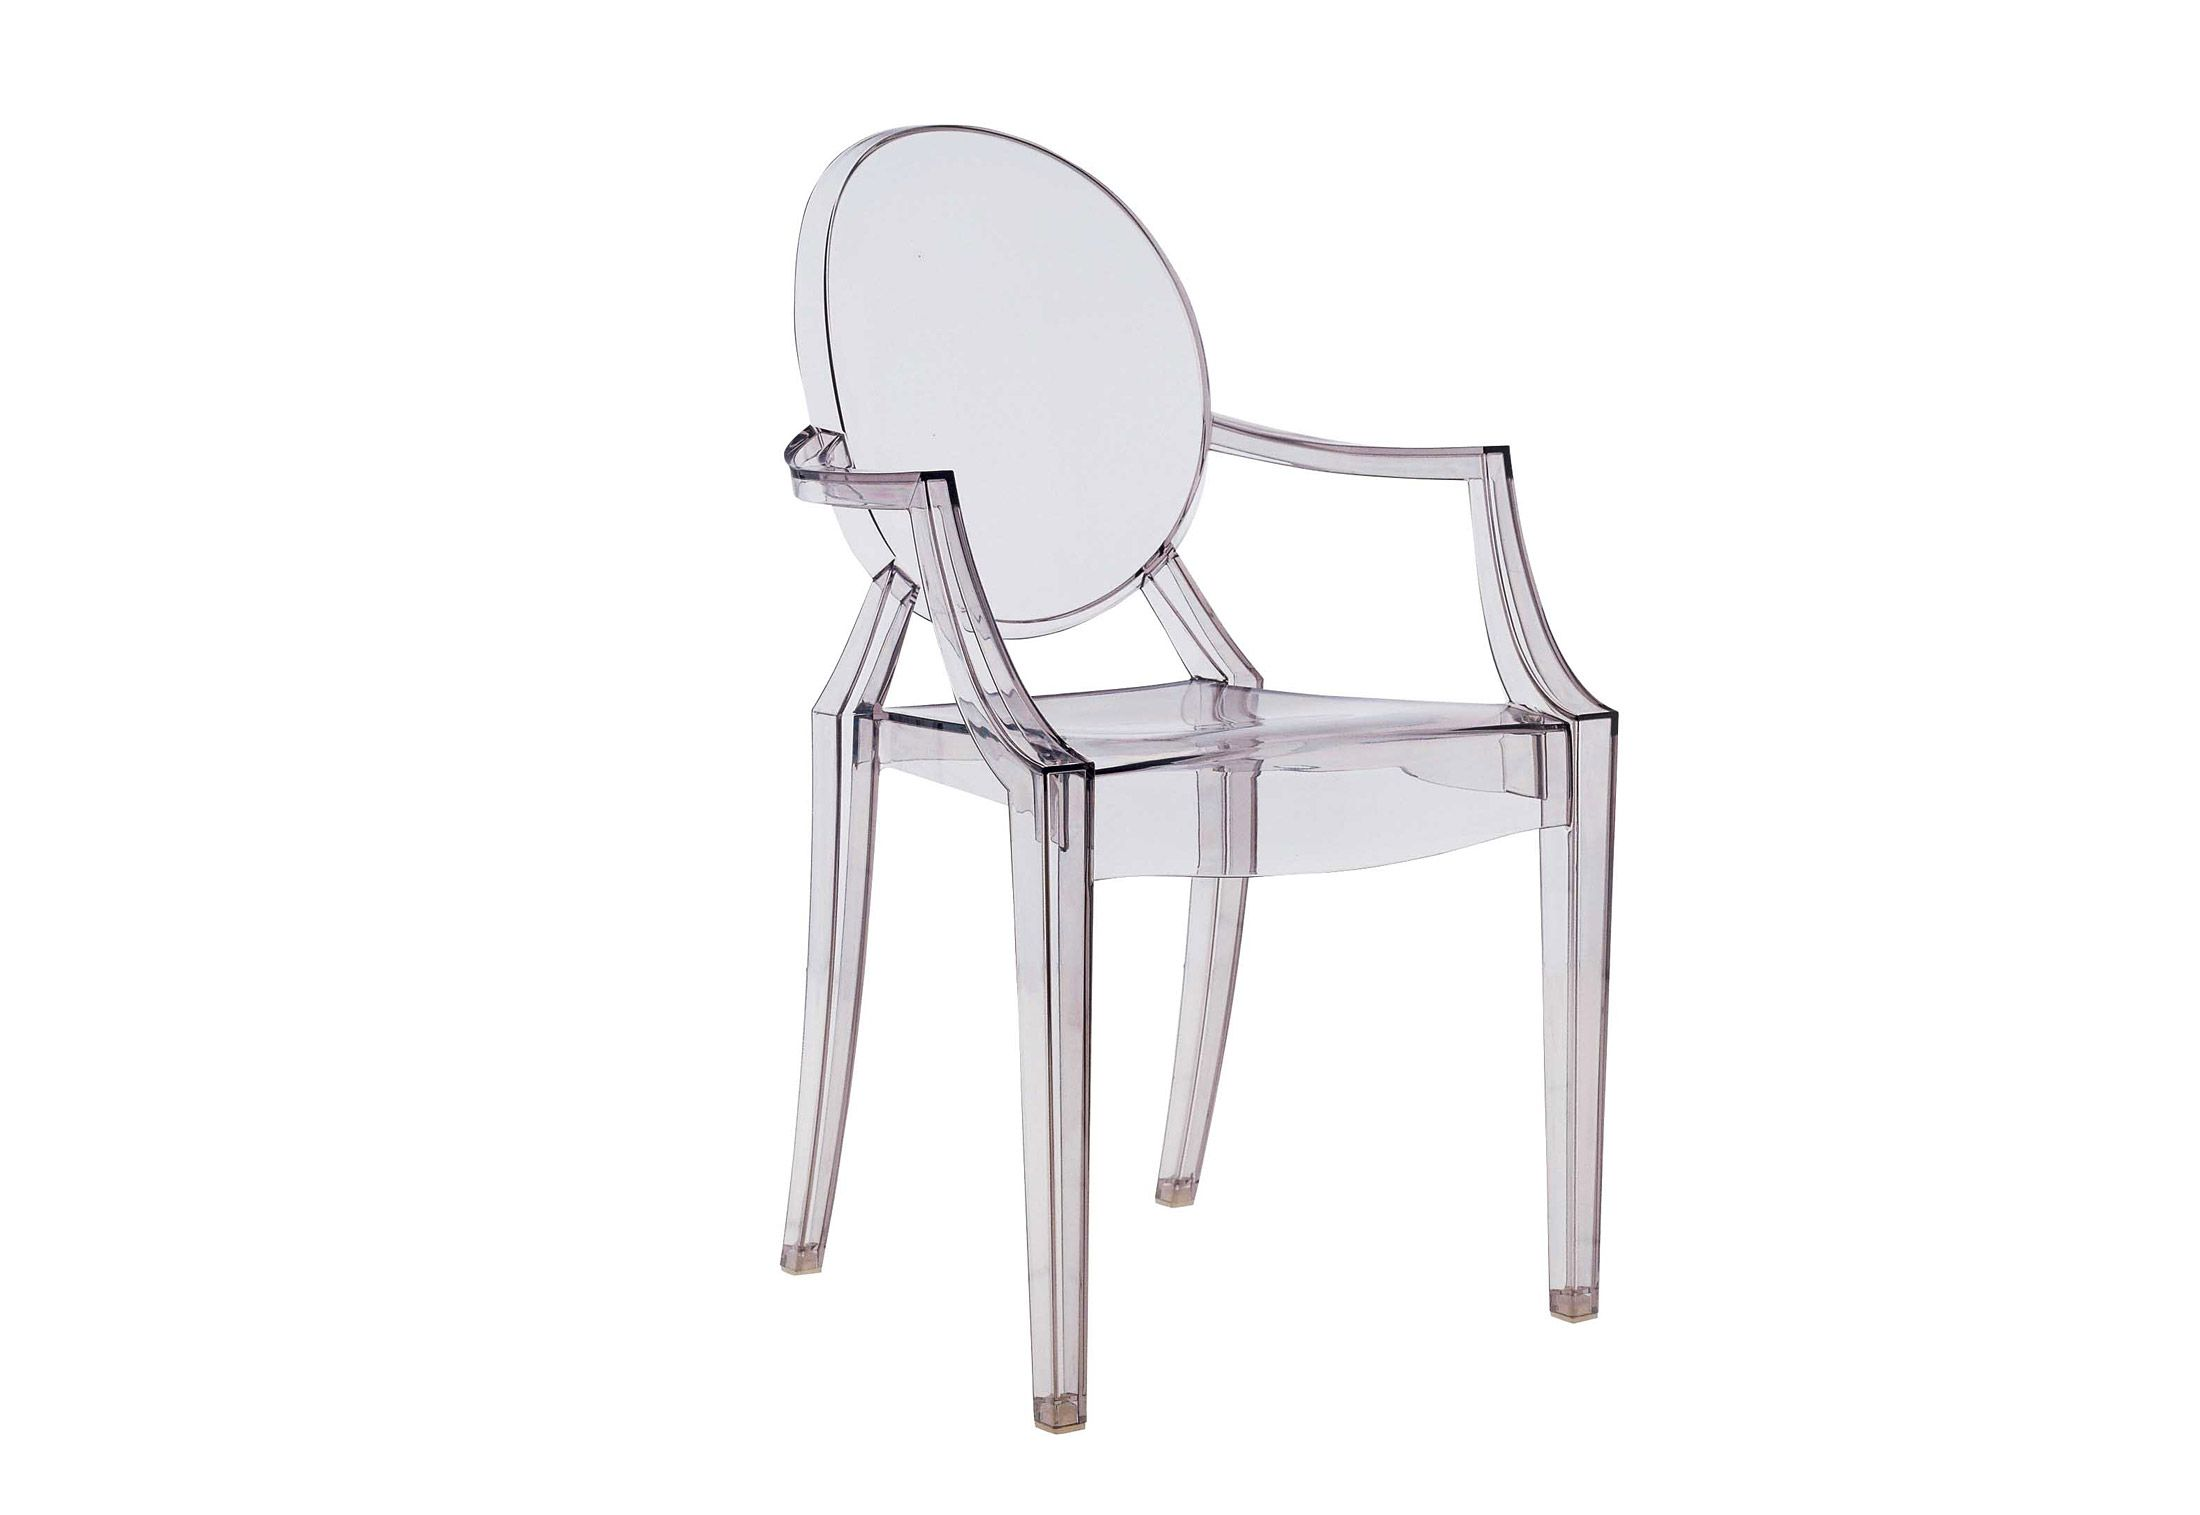 Louis Ghost Armchair Philippe Starck 2002 [Kartell]